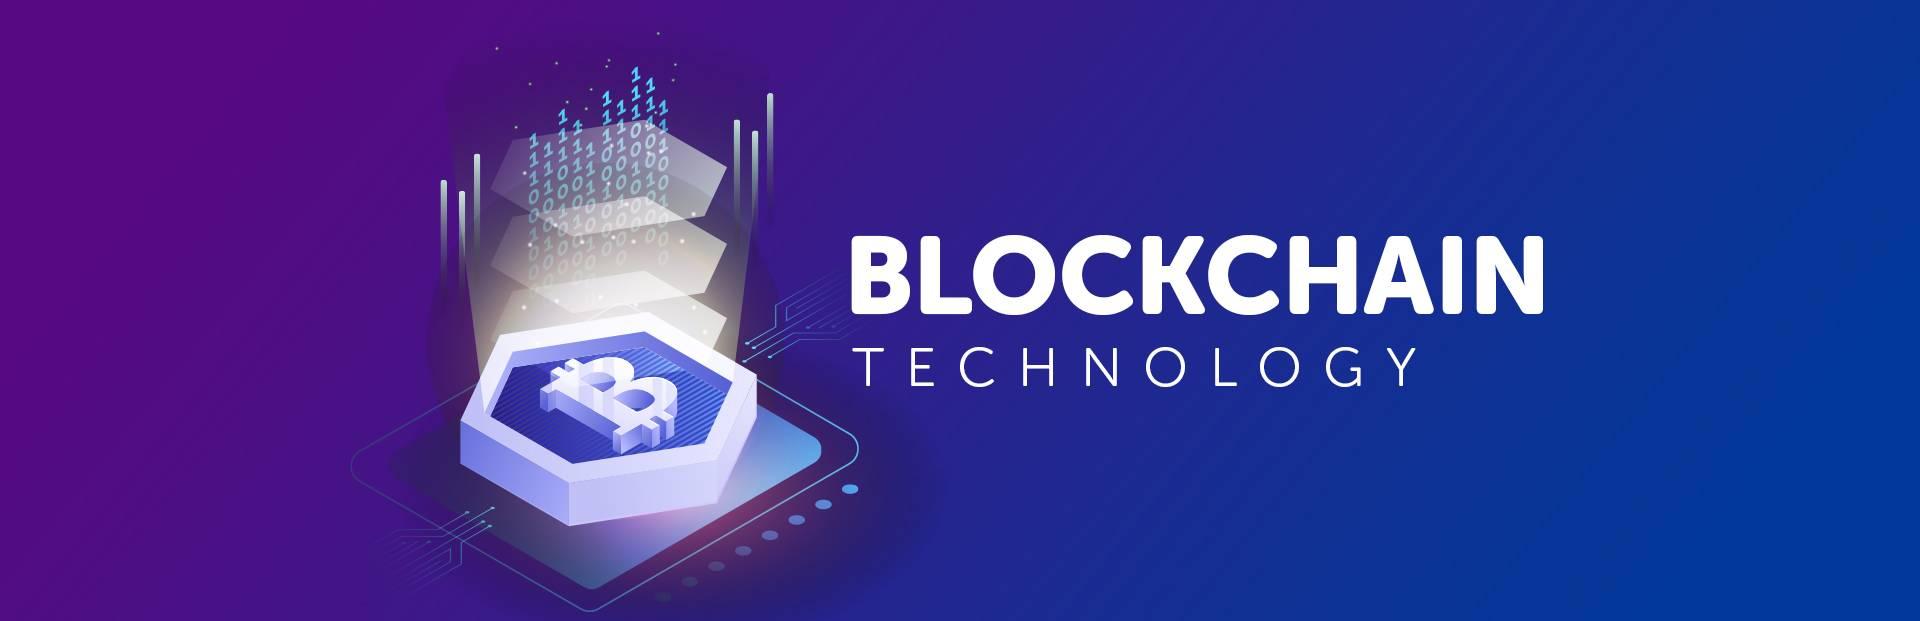 Blockchain: Revolutionizing the way industries do business